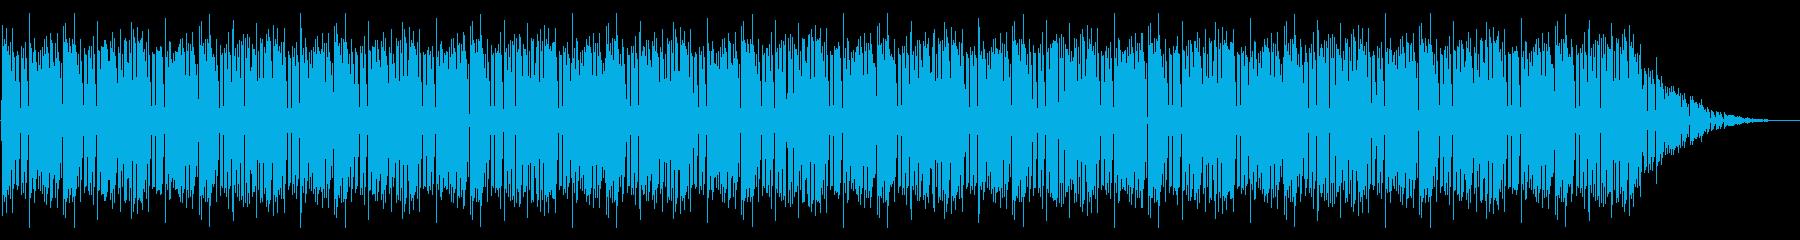 NES アクションC02-1(ステージセの再生済みの波形